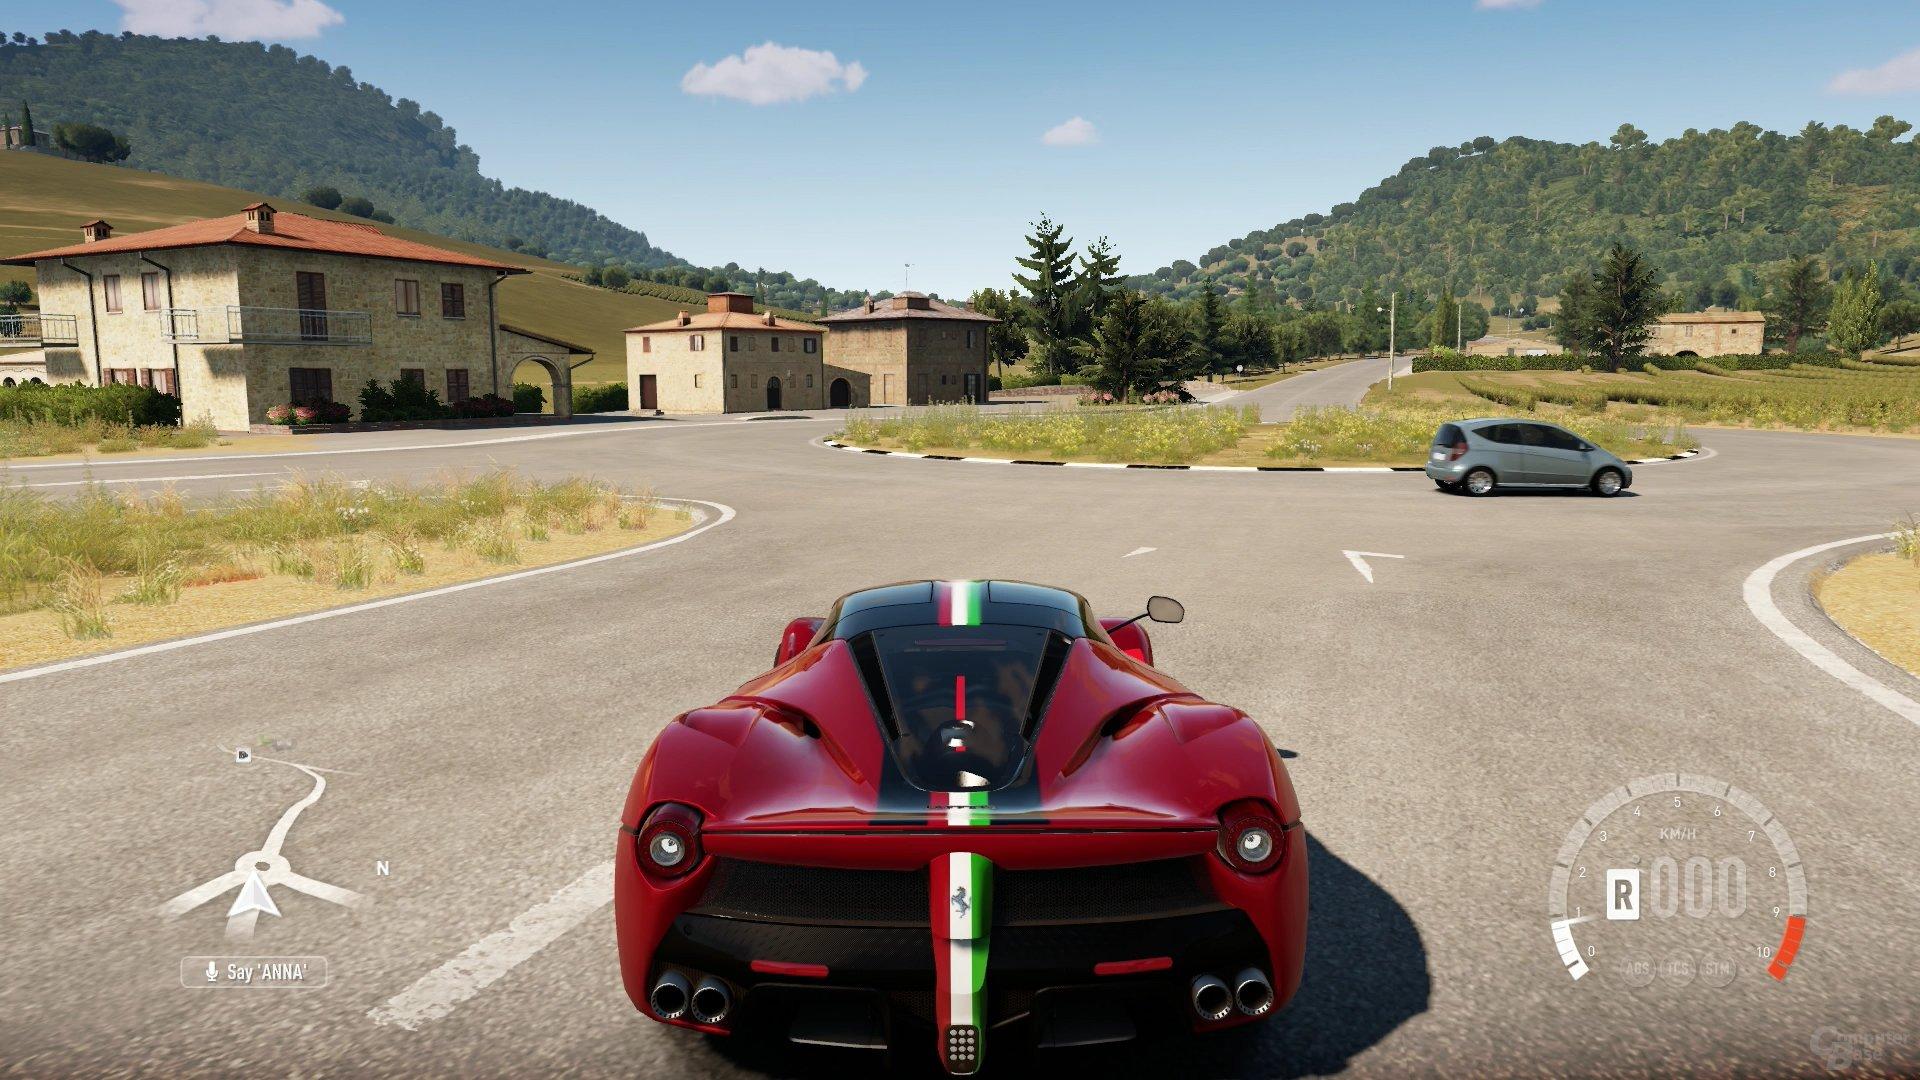 Xbox-Streaming über 802.11n-WLAN (Xbox)